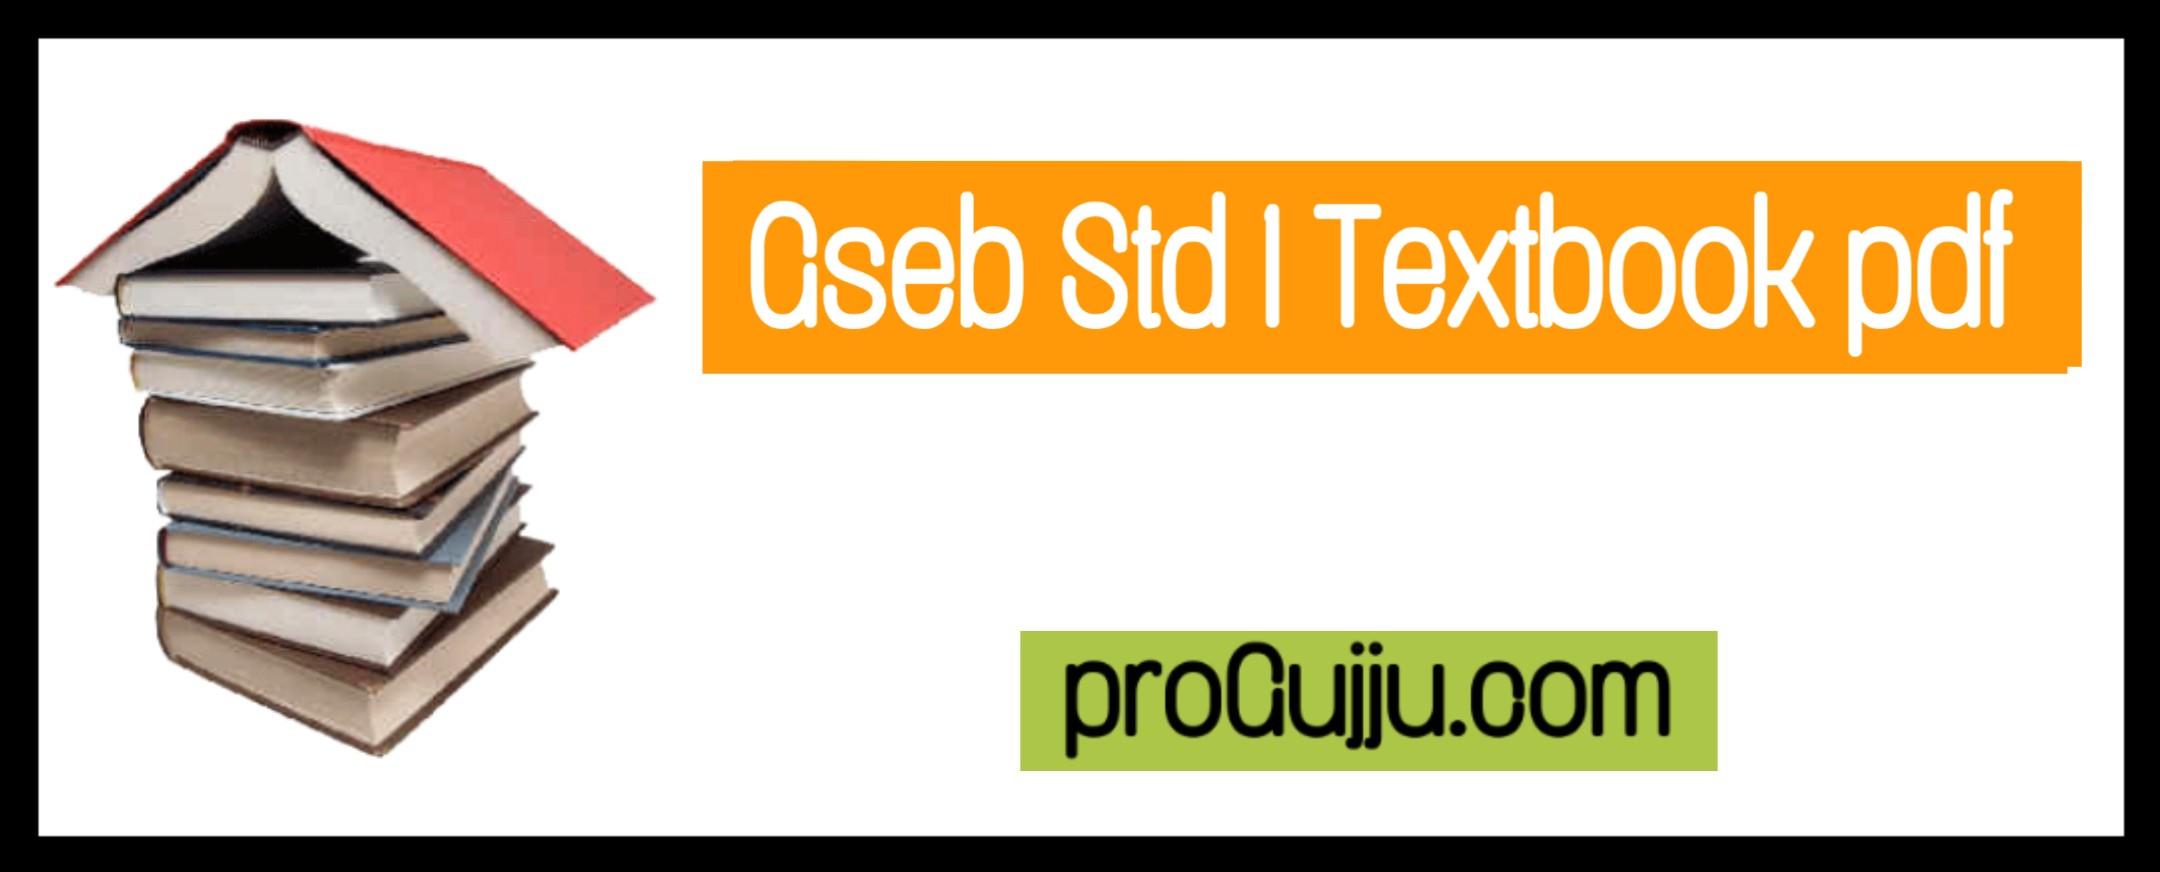 GSEB Std 1 Textbook pdf